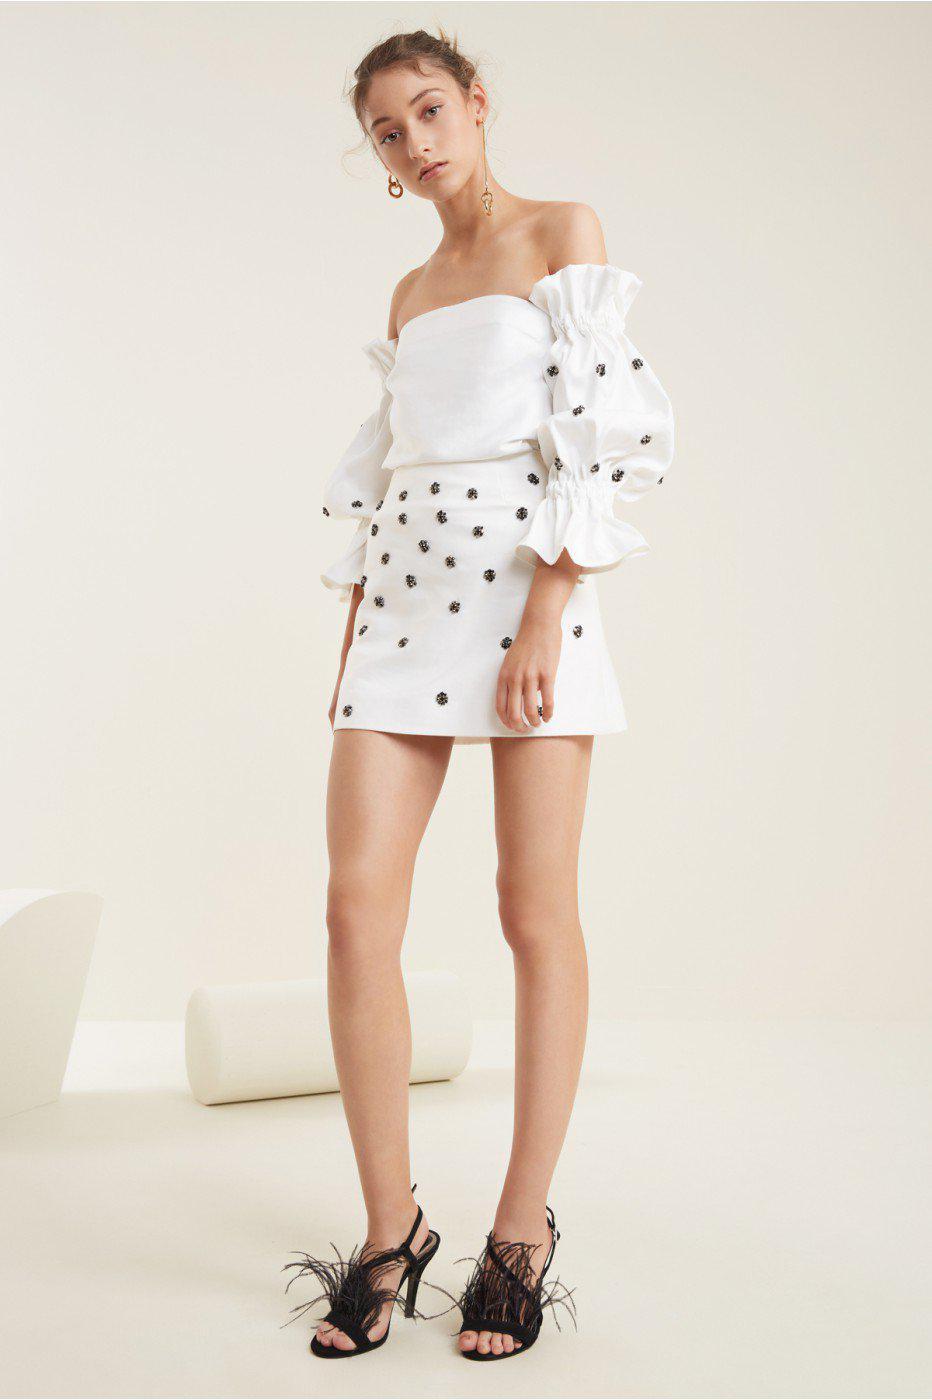 37d534da5bc353 C/meo Collective Assemble Mini Skirt in White - Lyst